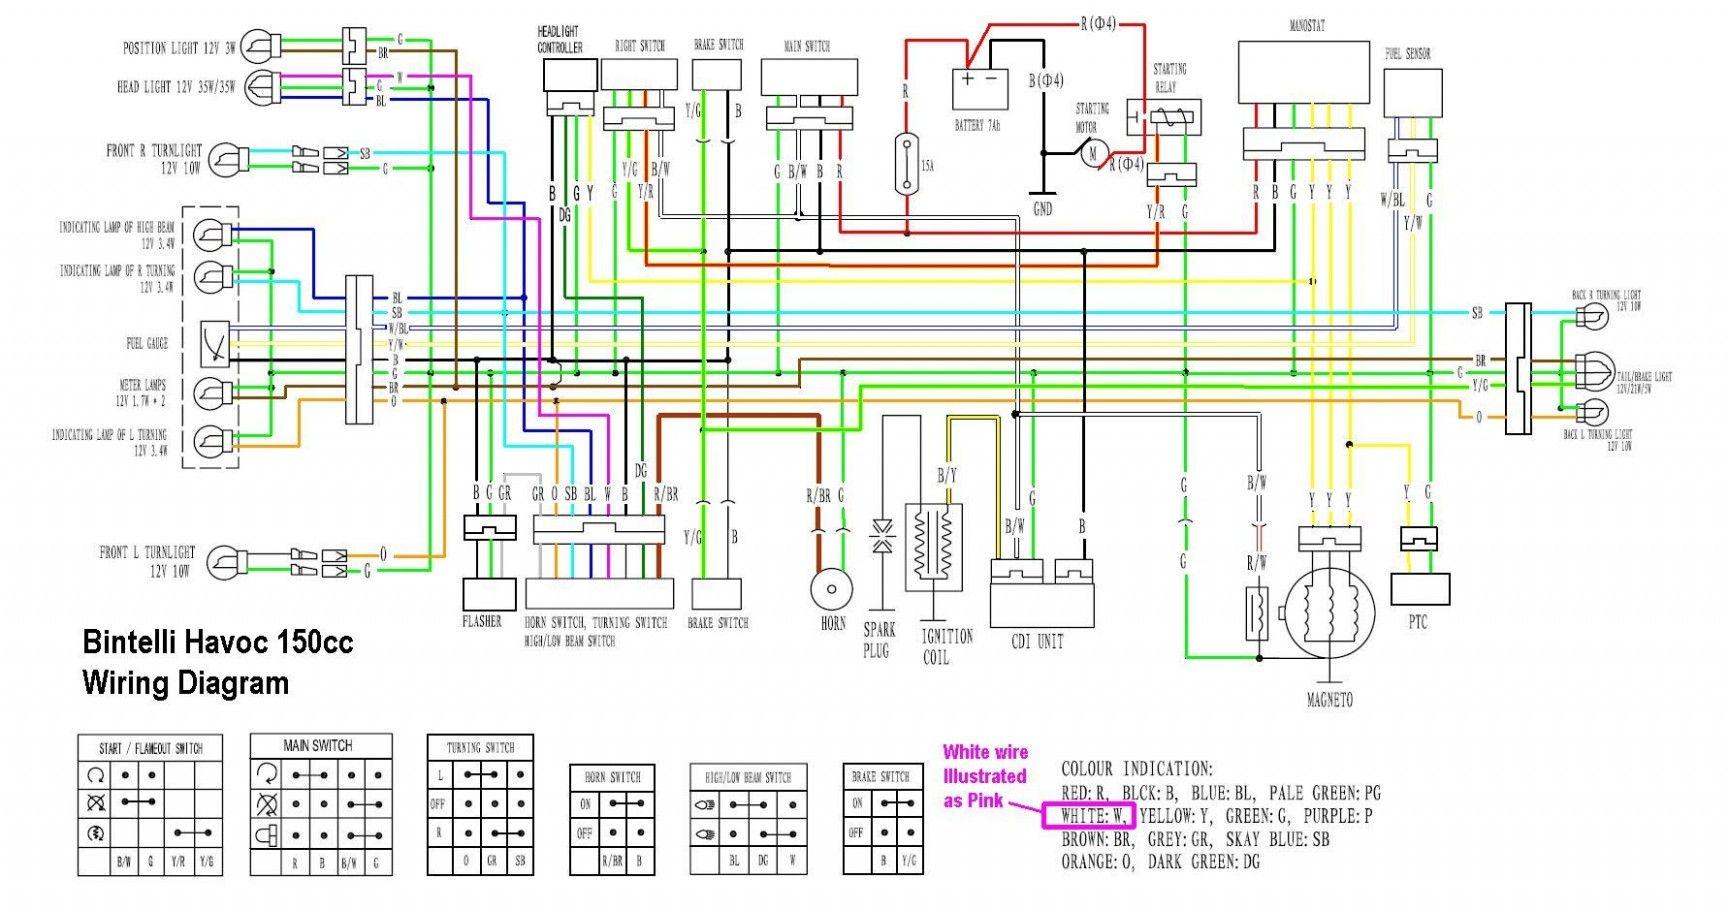 Gy7 Engine Diagram Manual Gy7 Engine Diagram Manual gy6